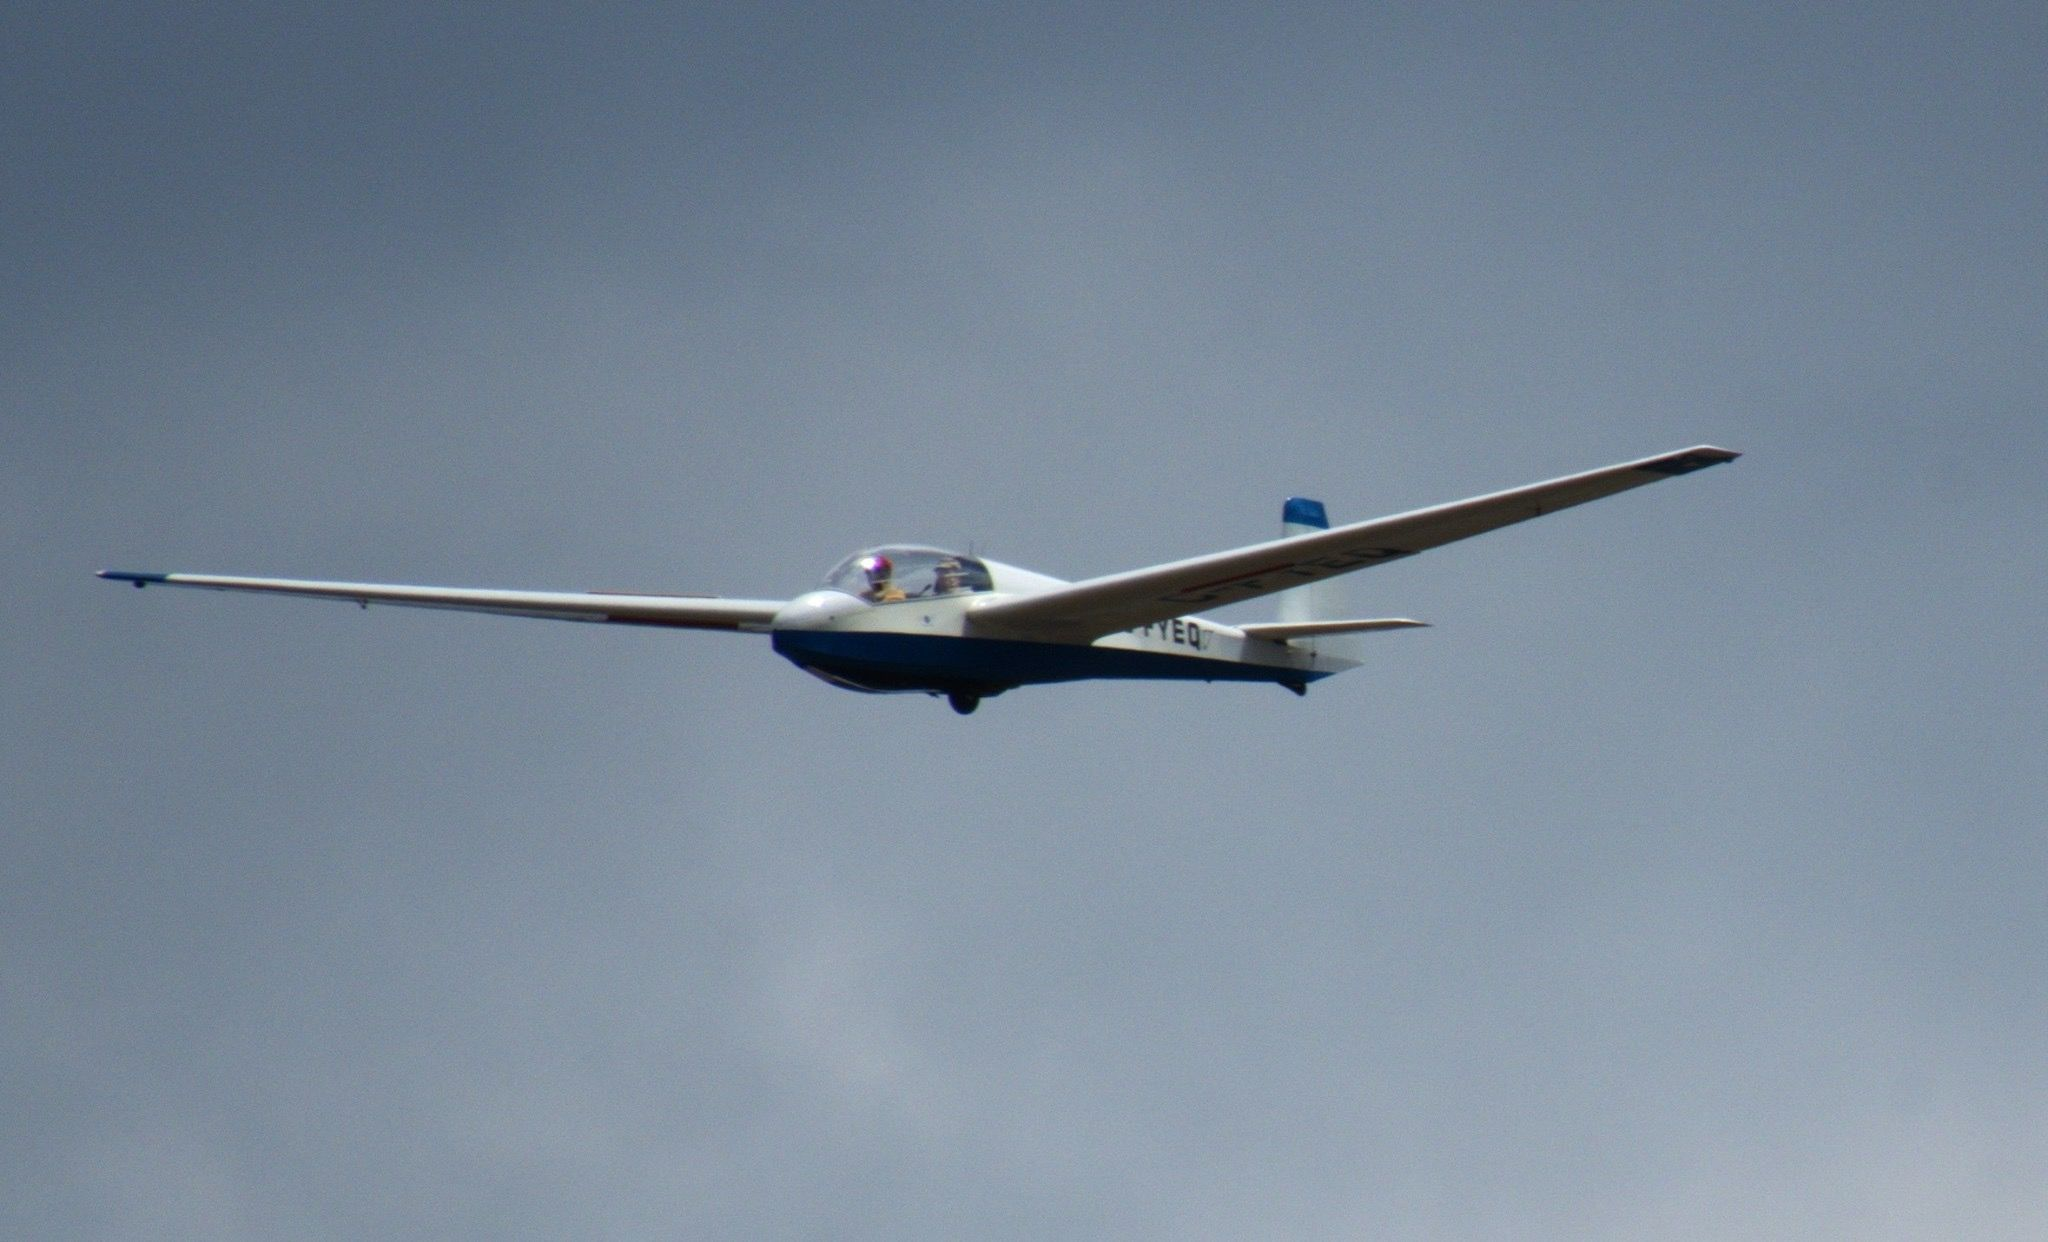 Pin by Al Mangani on Gliders PreGlass! Gliders